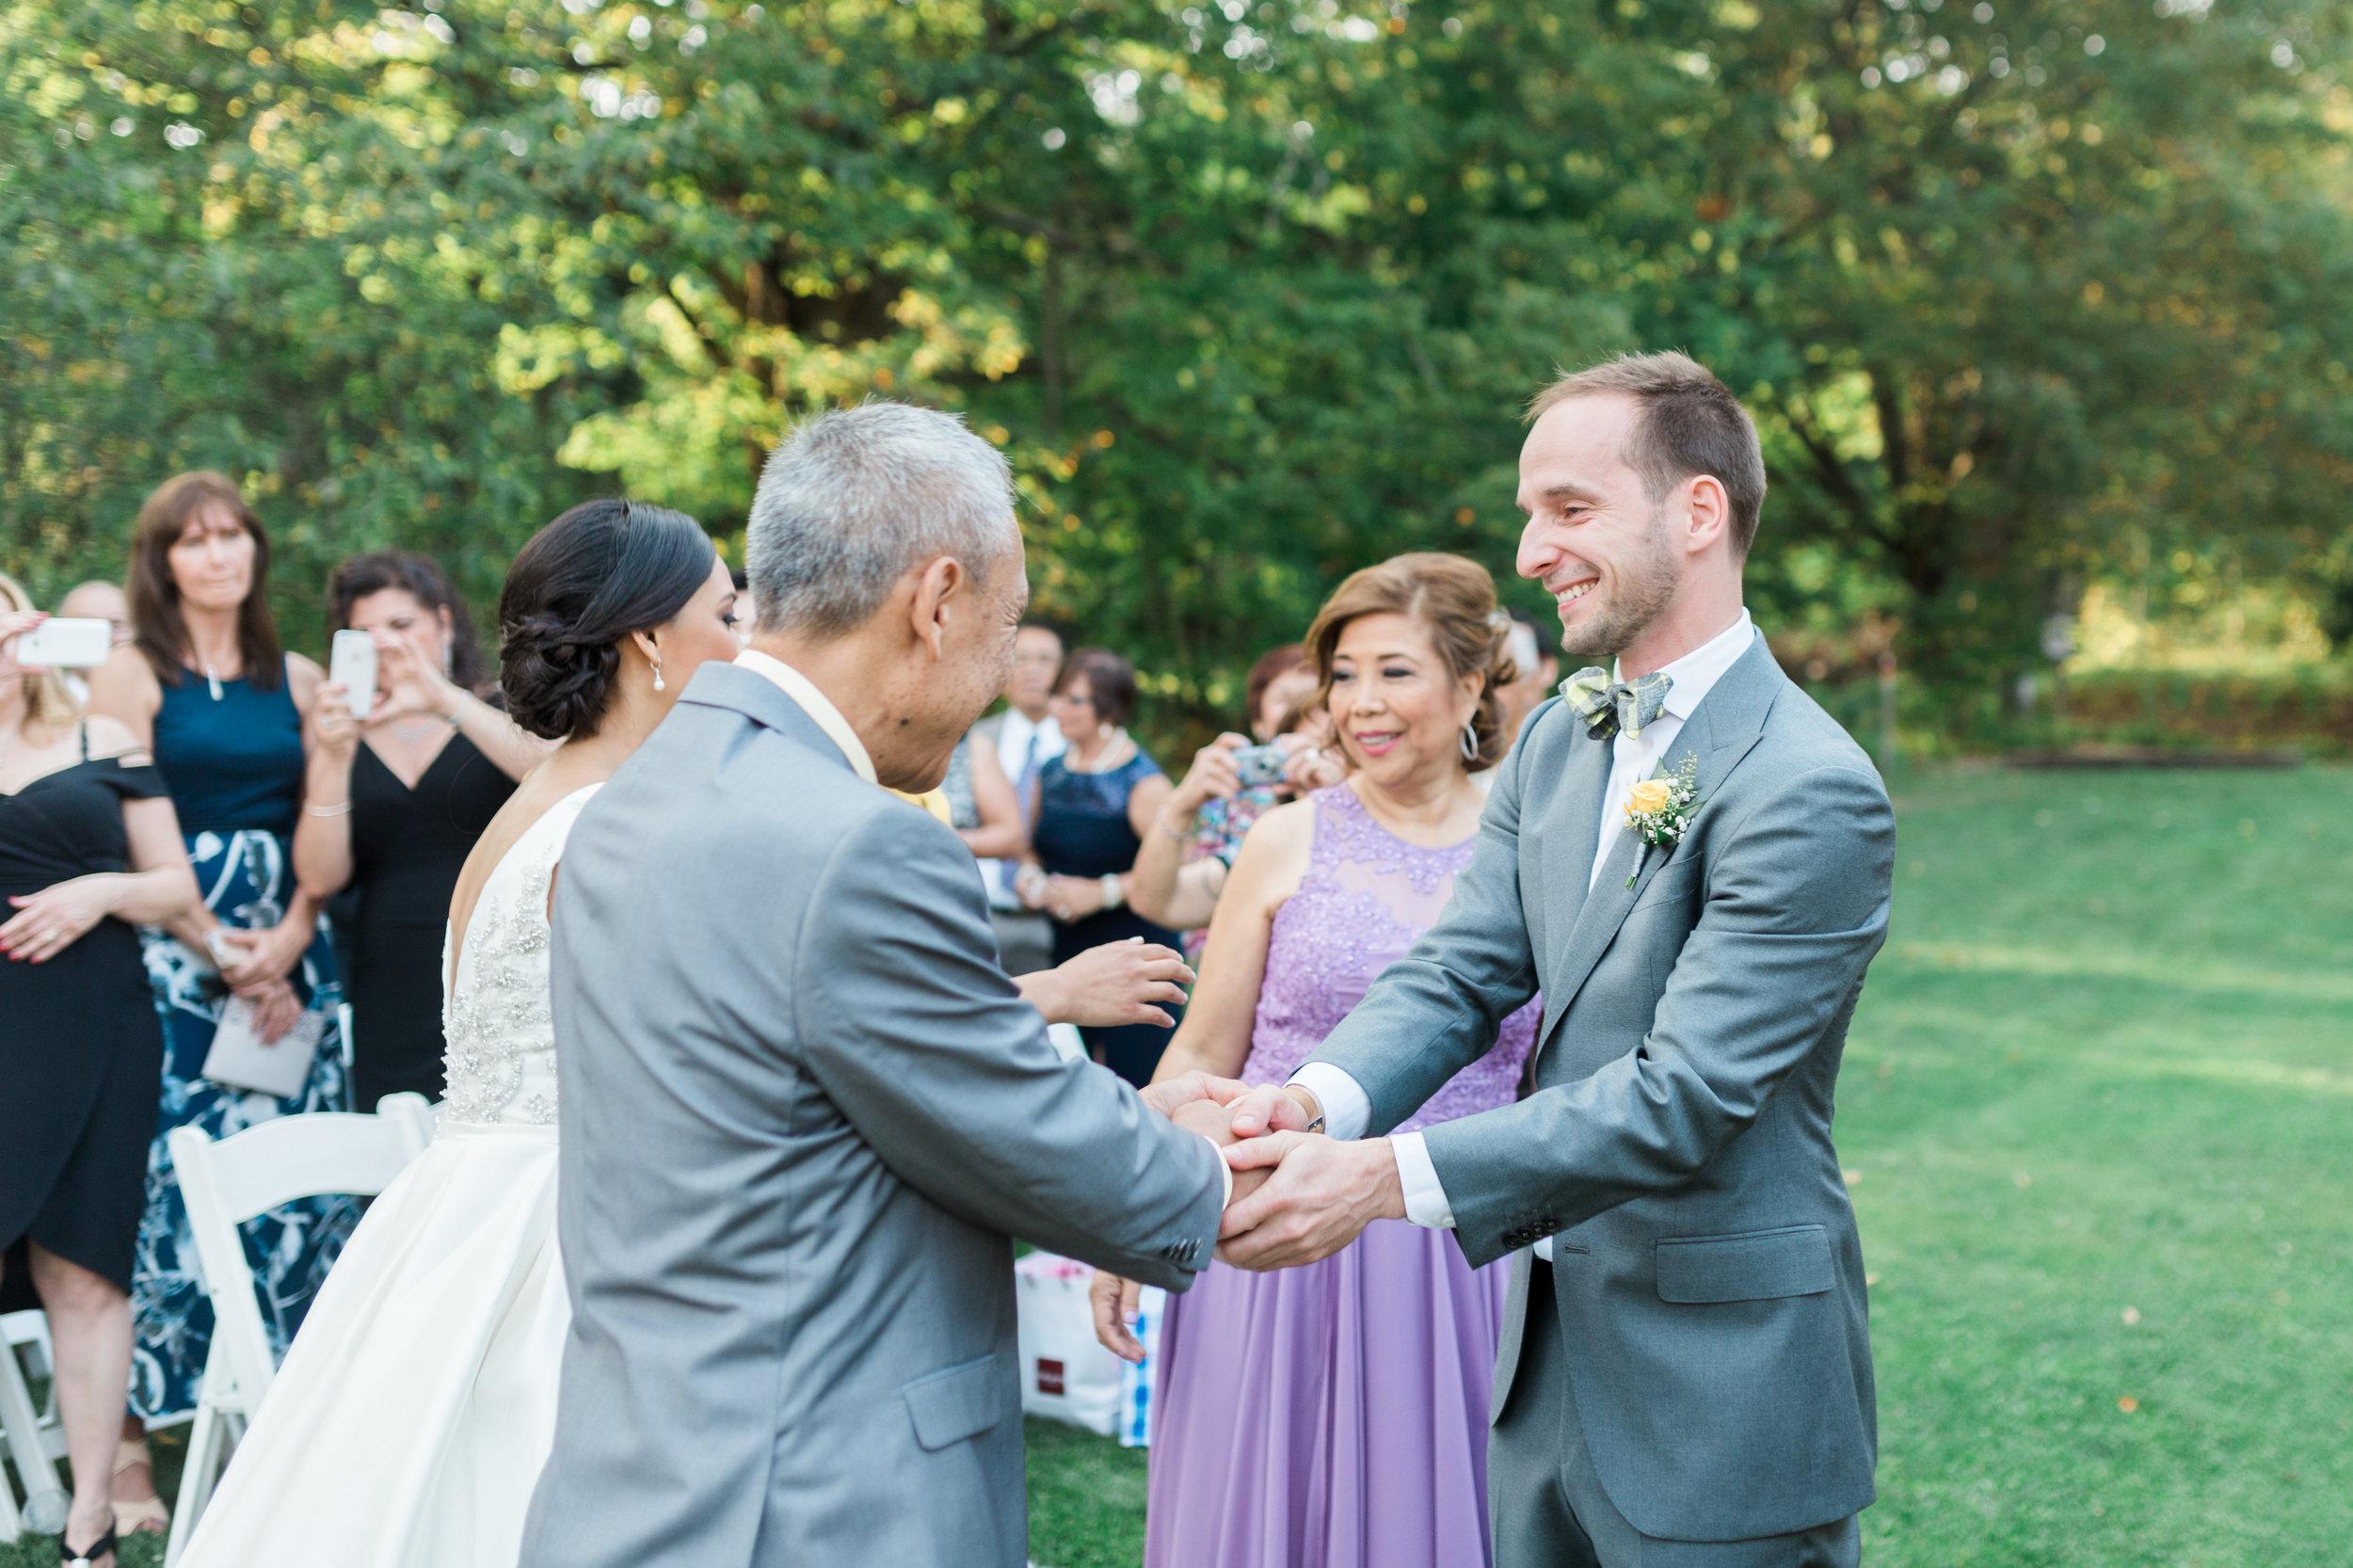 Alton Mills Wedding - Ceremony-45.jpg